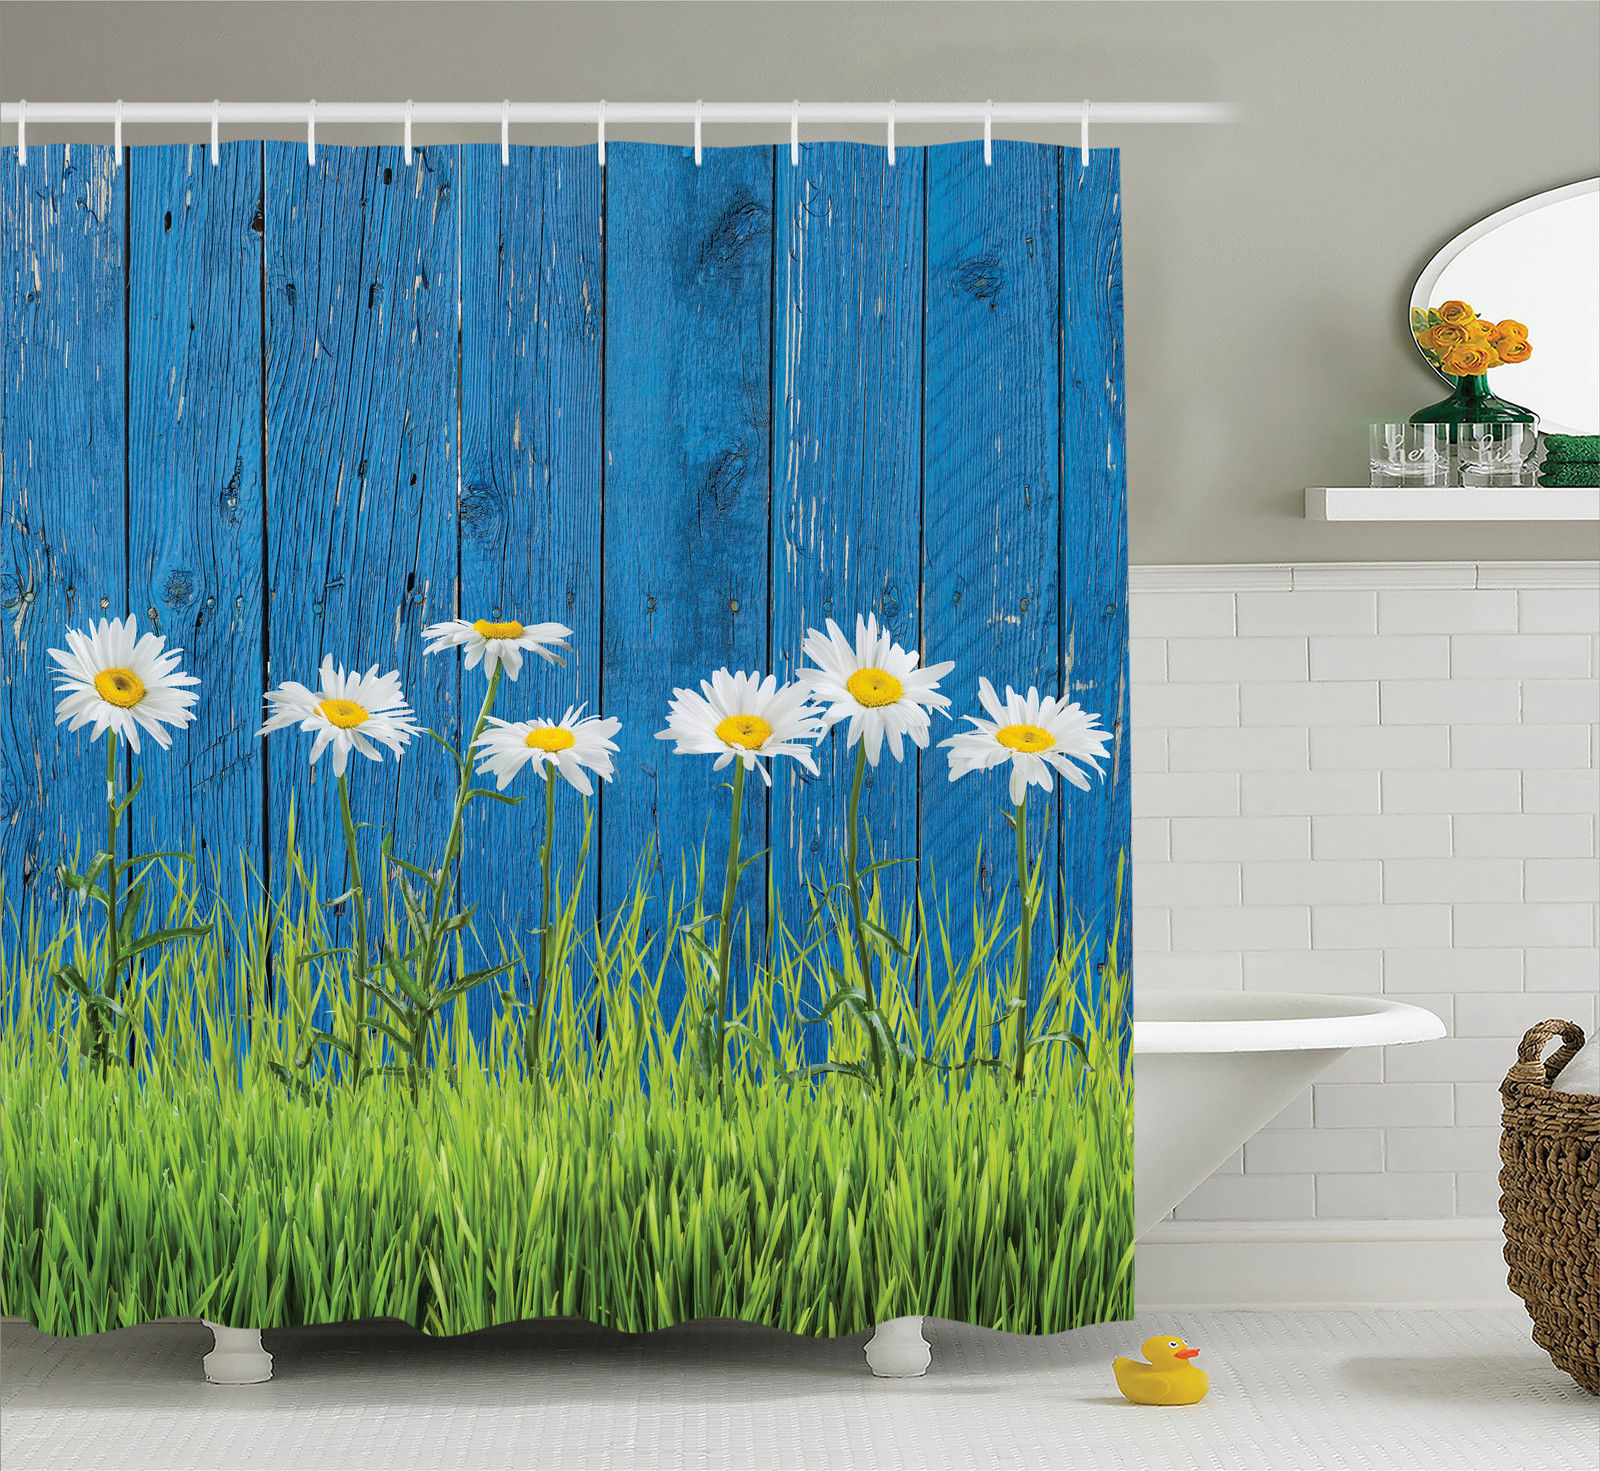 Flower Decor Fresh Spring Grass And Daisy On A Fence Summer Simple ...